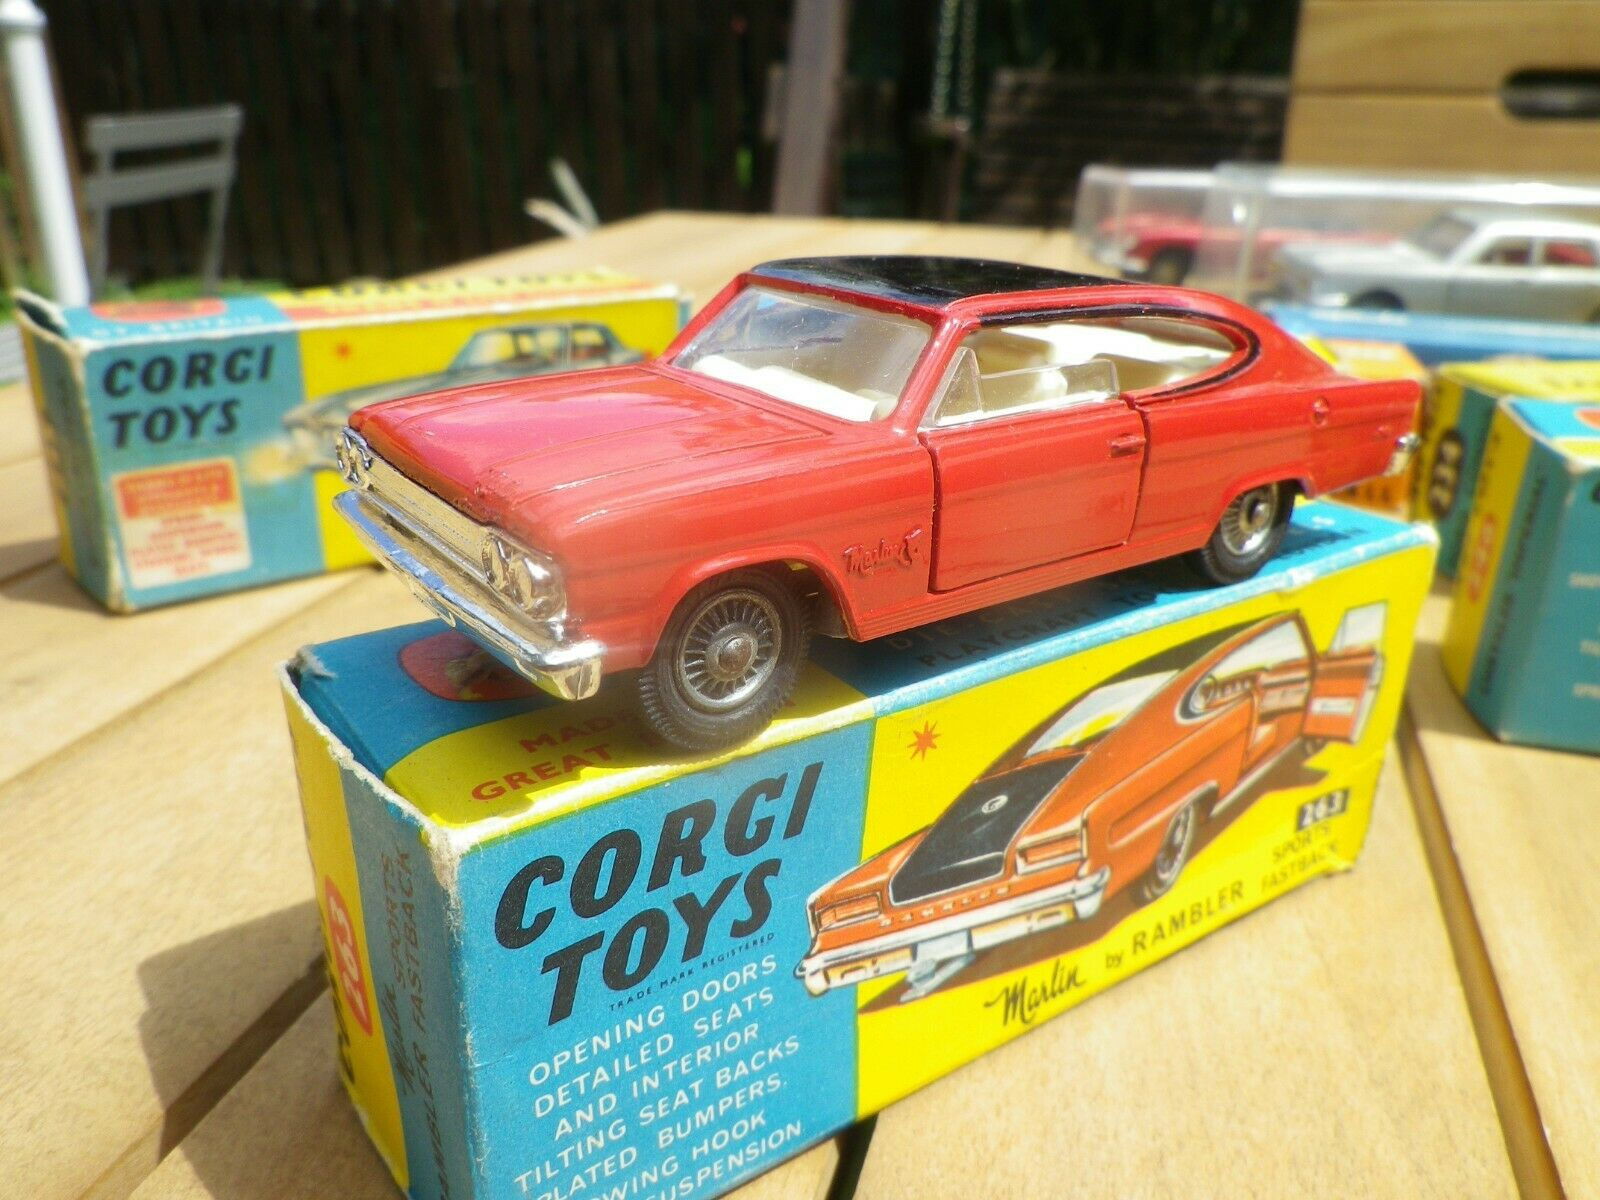 Corgi toys 263 marlin rambler mint in its original box